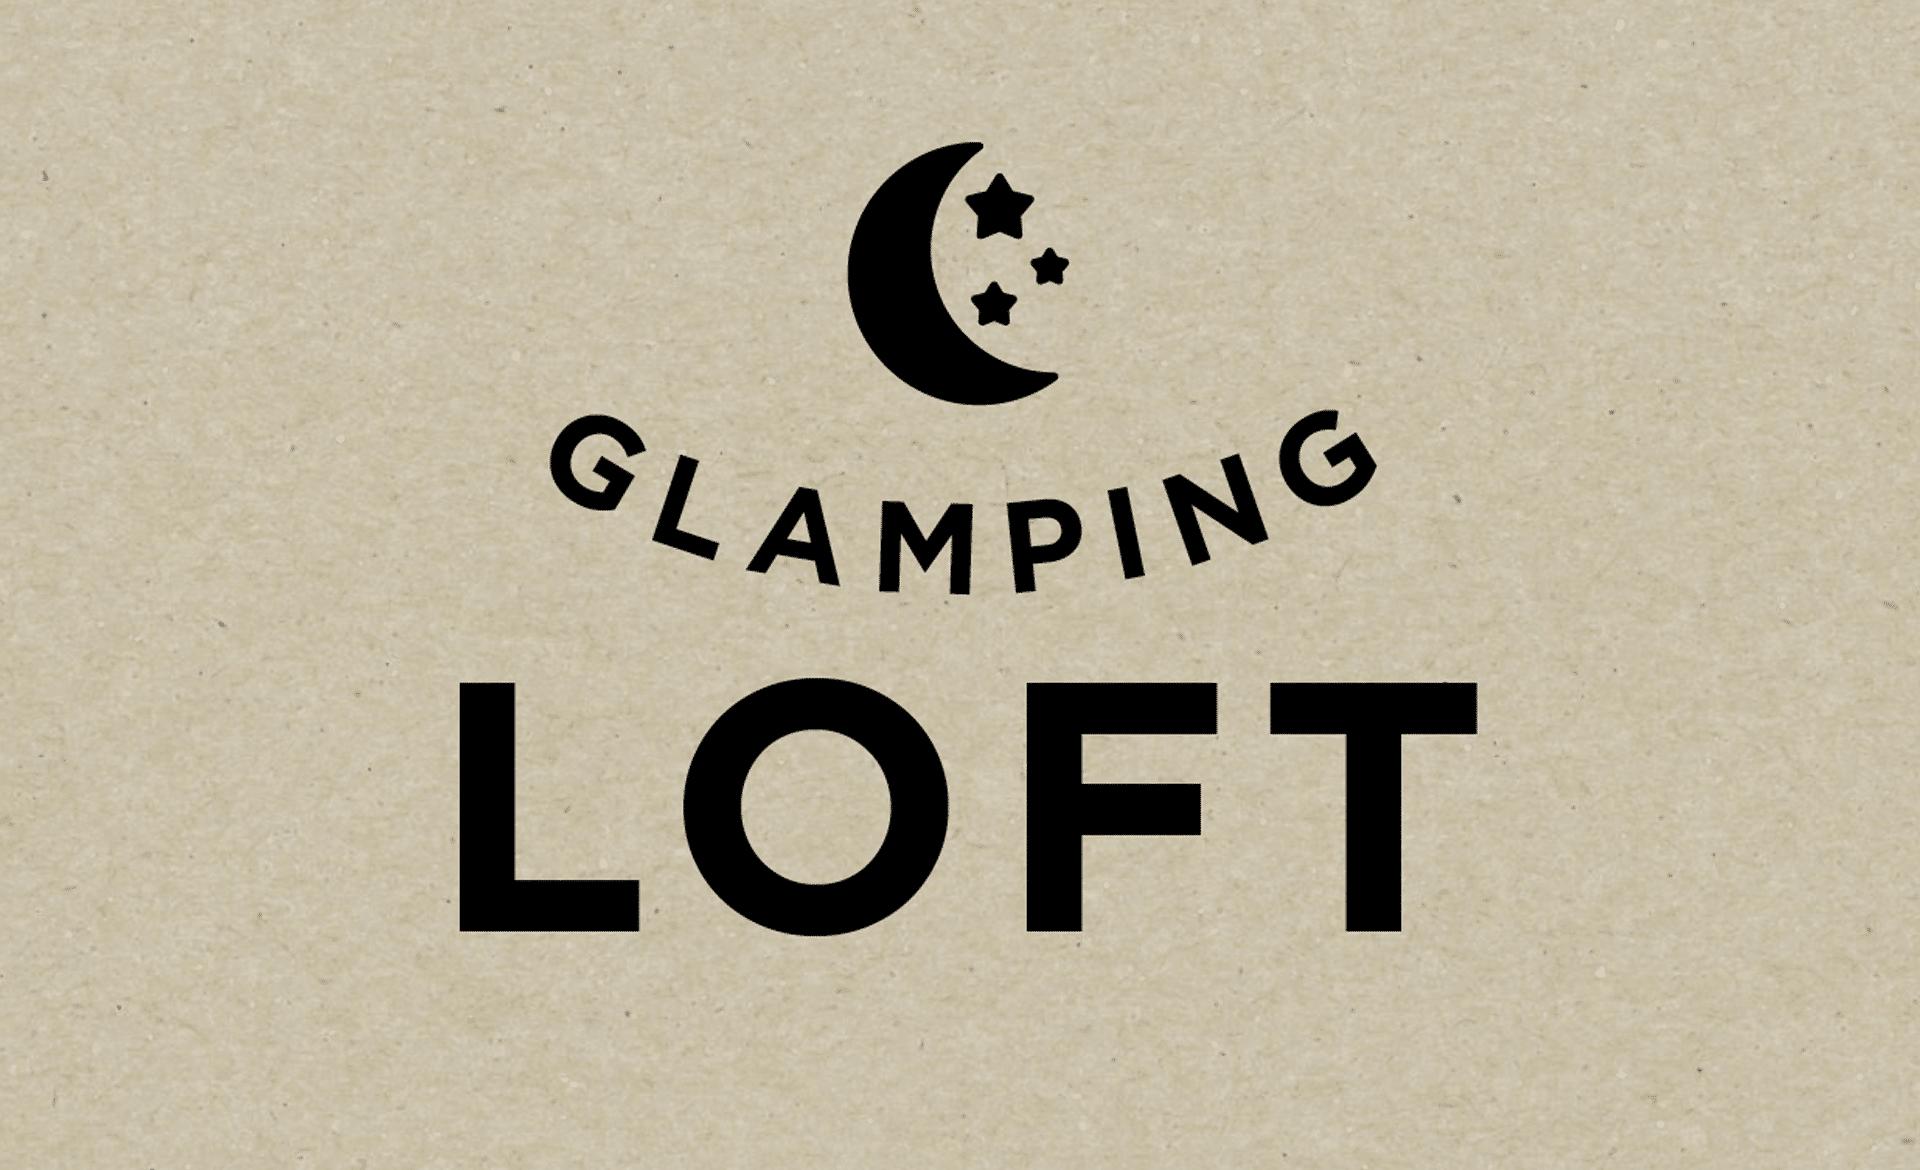 Logo Glamping Loft in der Wasnerin